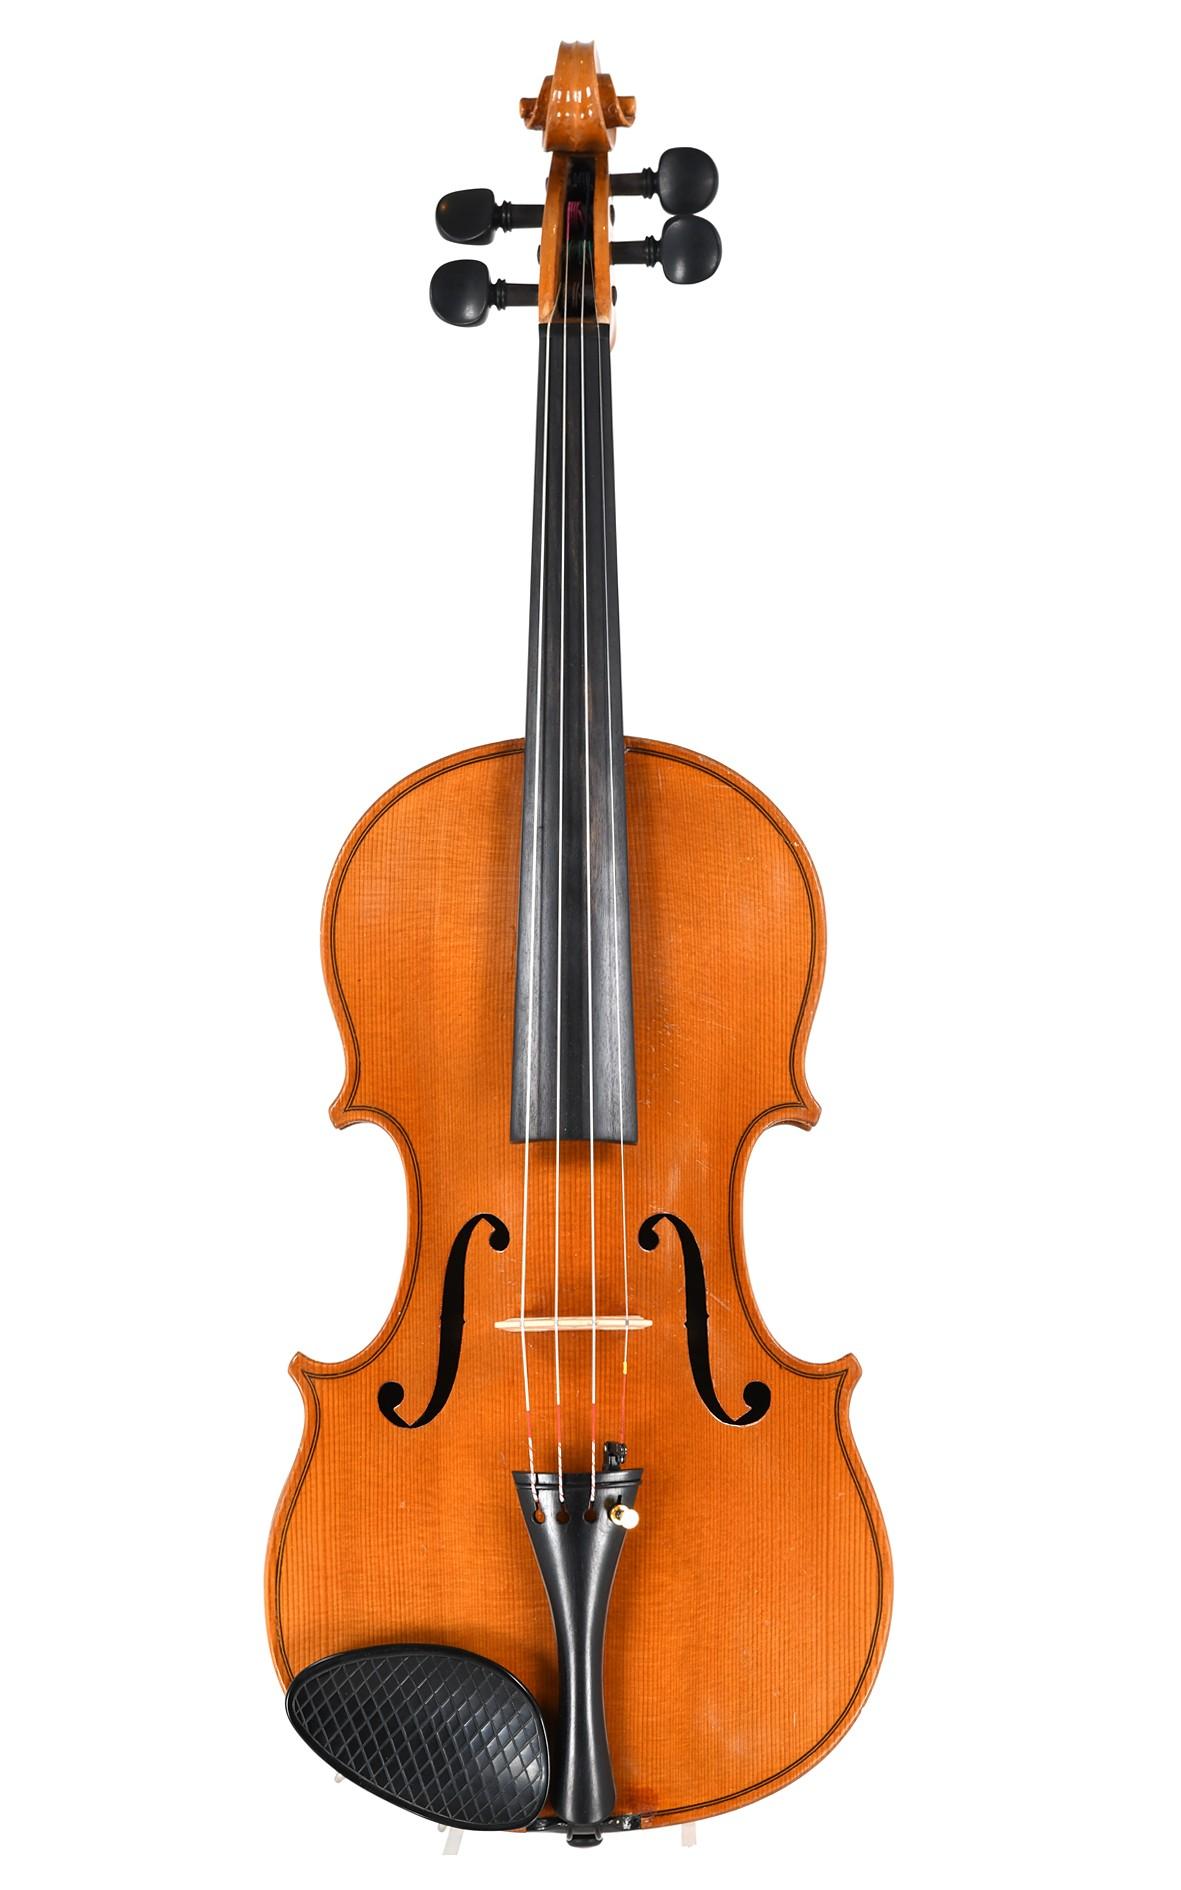 Meinel & Herold Klingenthal violin approx. 1950 - top